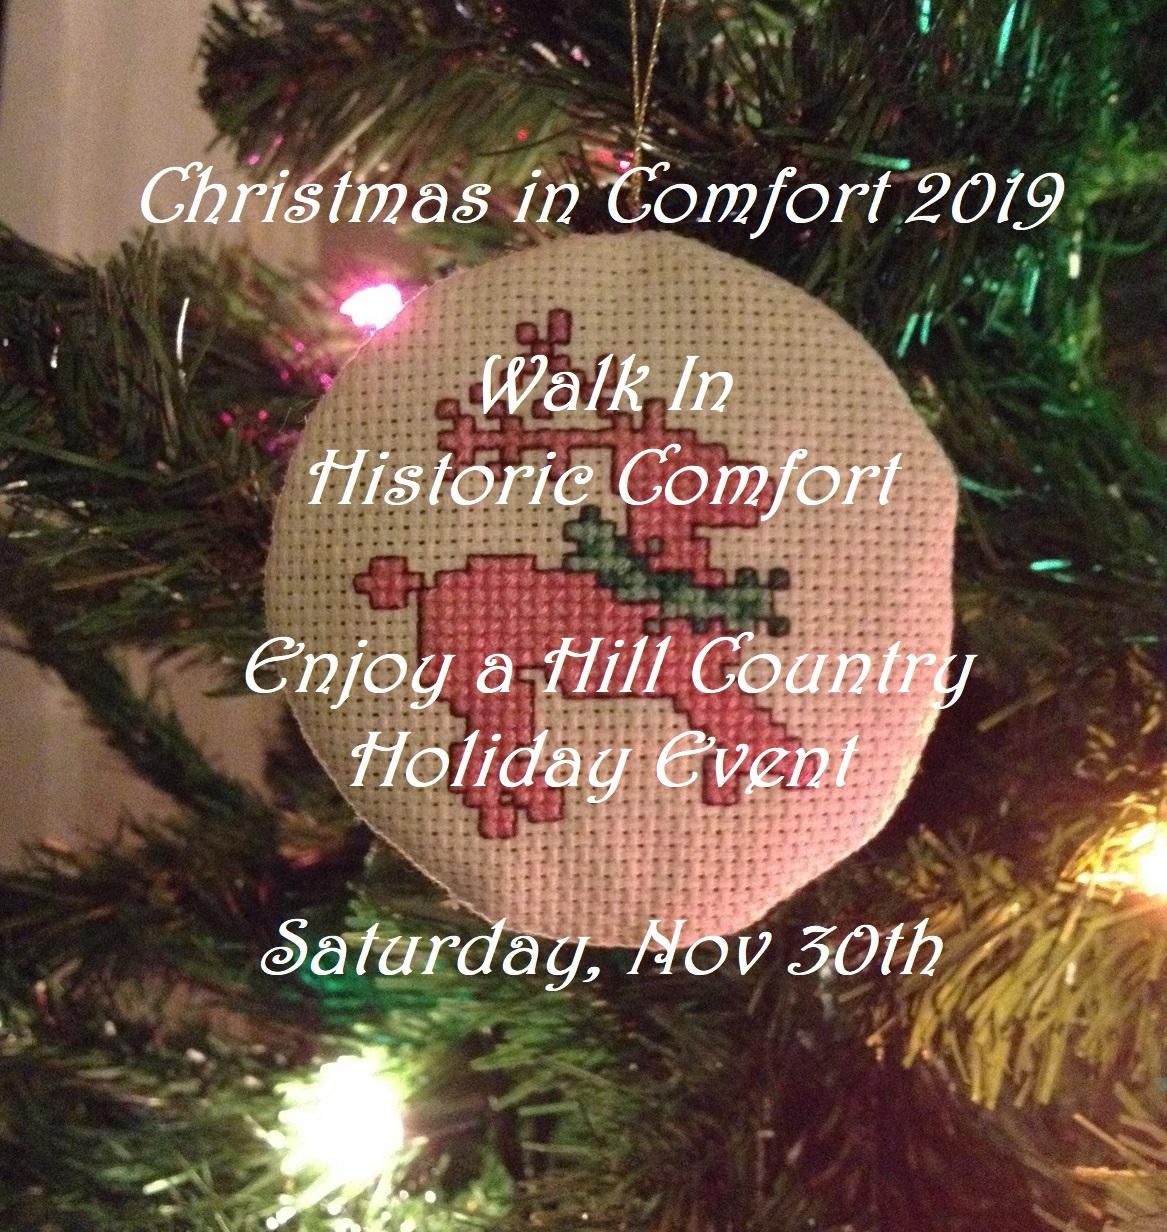 Christmas in Comfort Walk Nov 30th